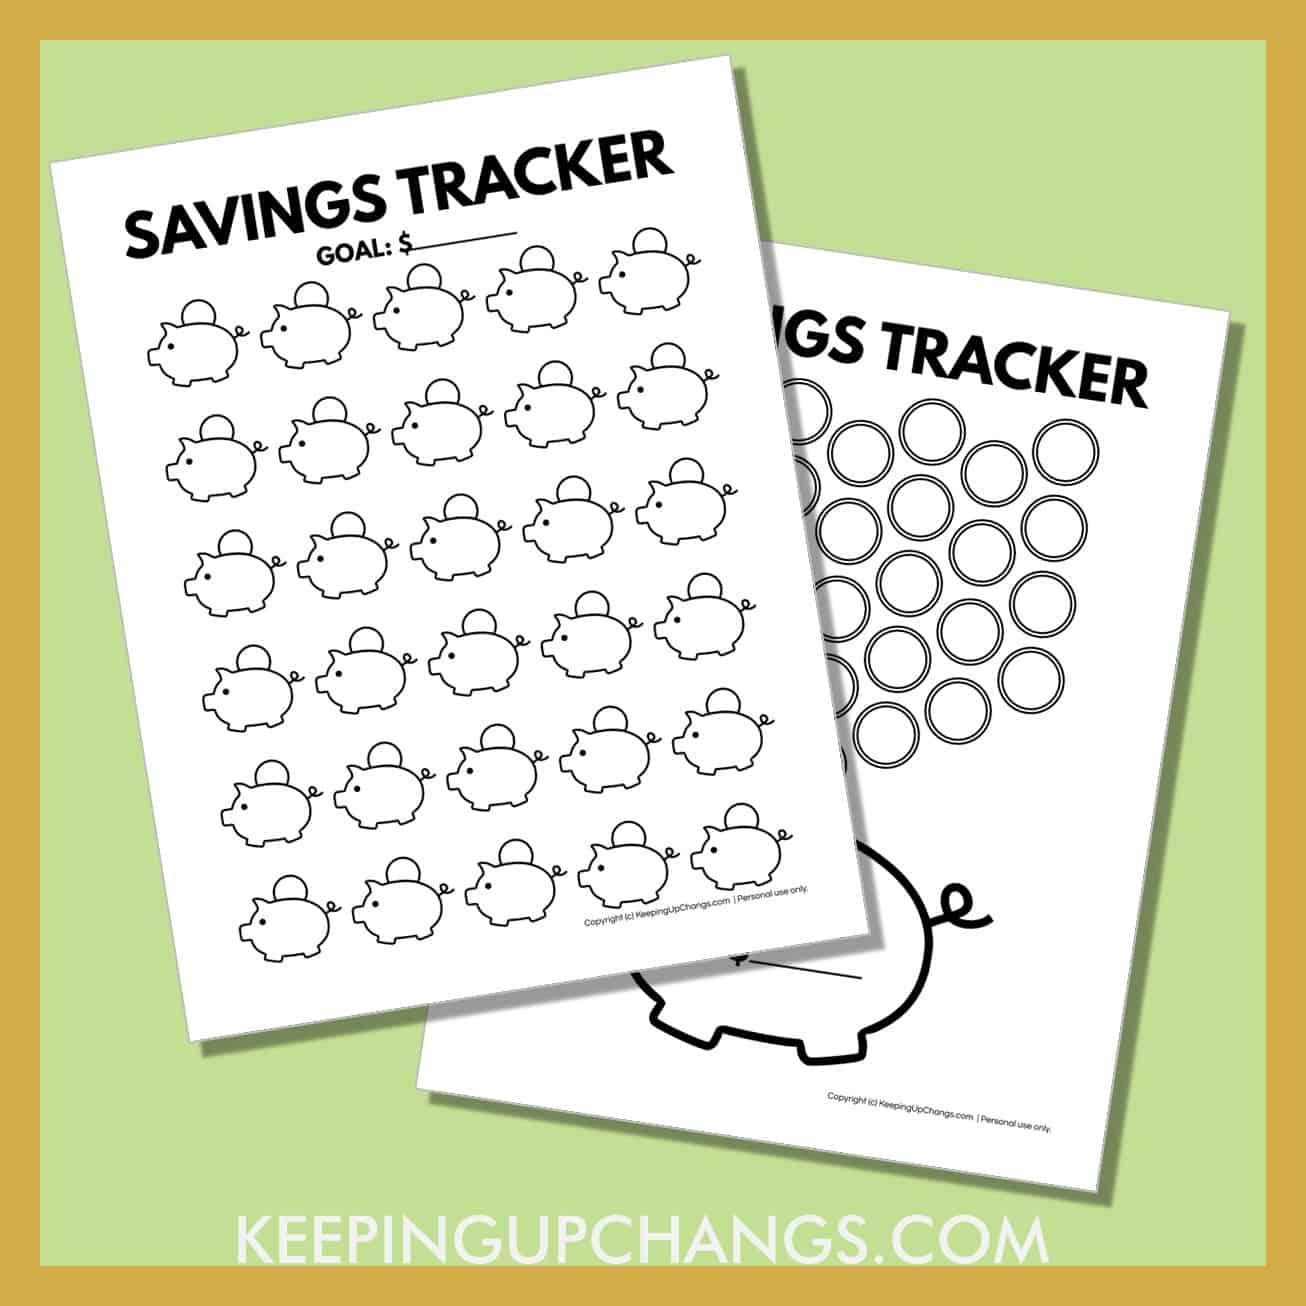 spread of free piggy bank saving tracker printables.